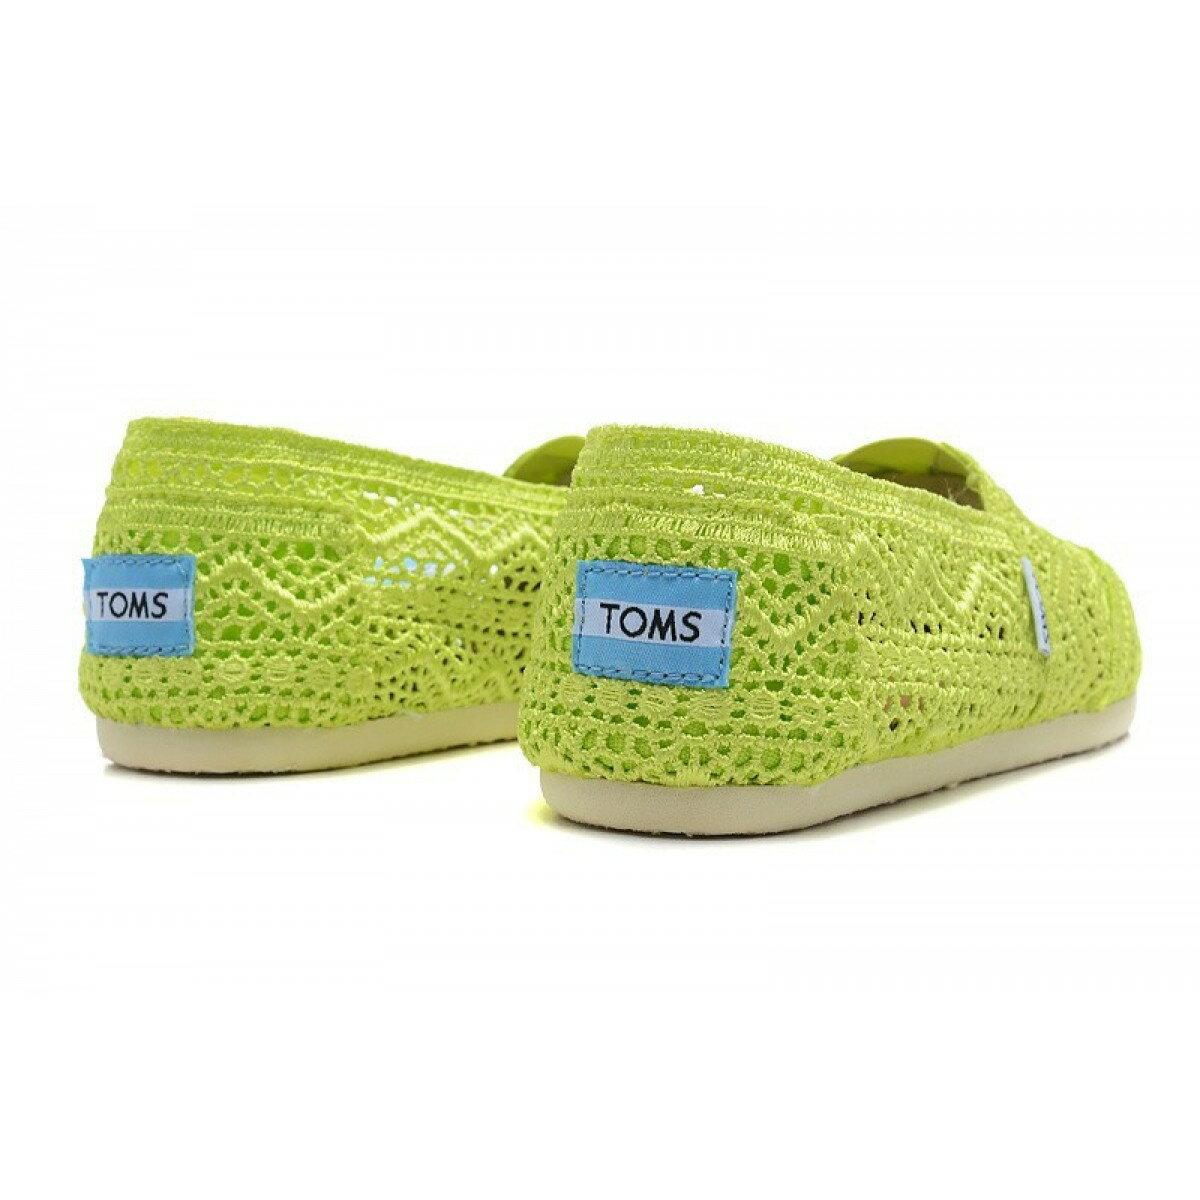 【TOMS】果綠色蕾絲鏤空繡花平底休閒鞋  Neon Lime Crochet Women's Classics 4